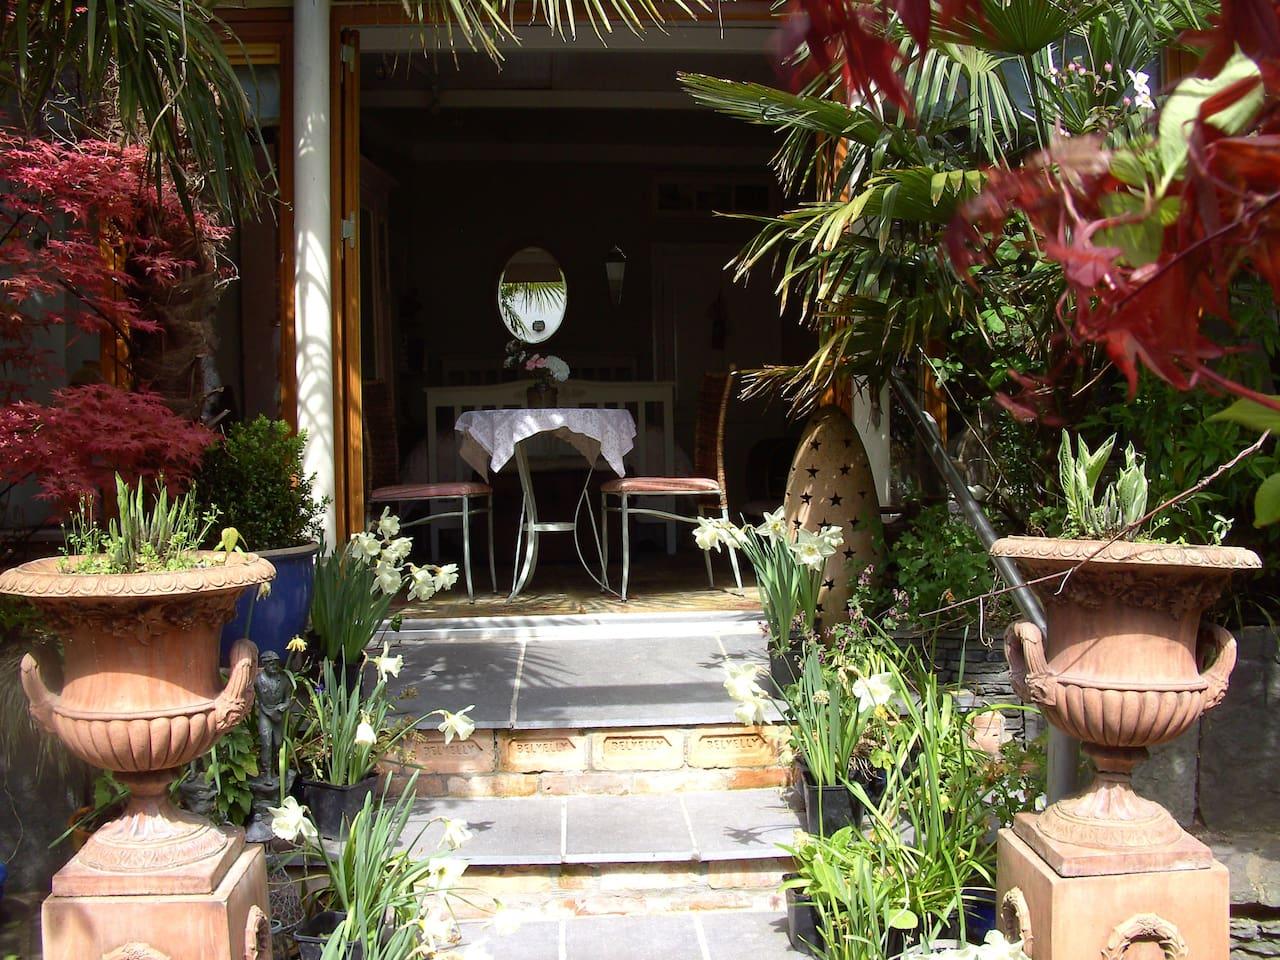 Garden Studio Apartment from courtyard